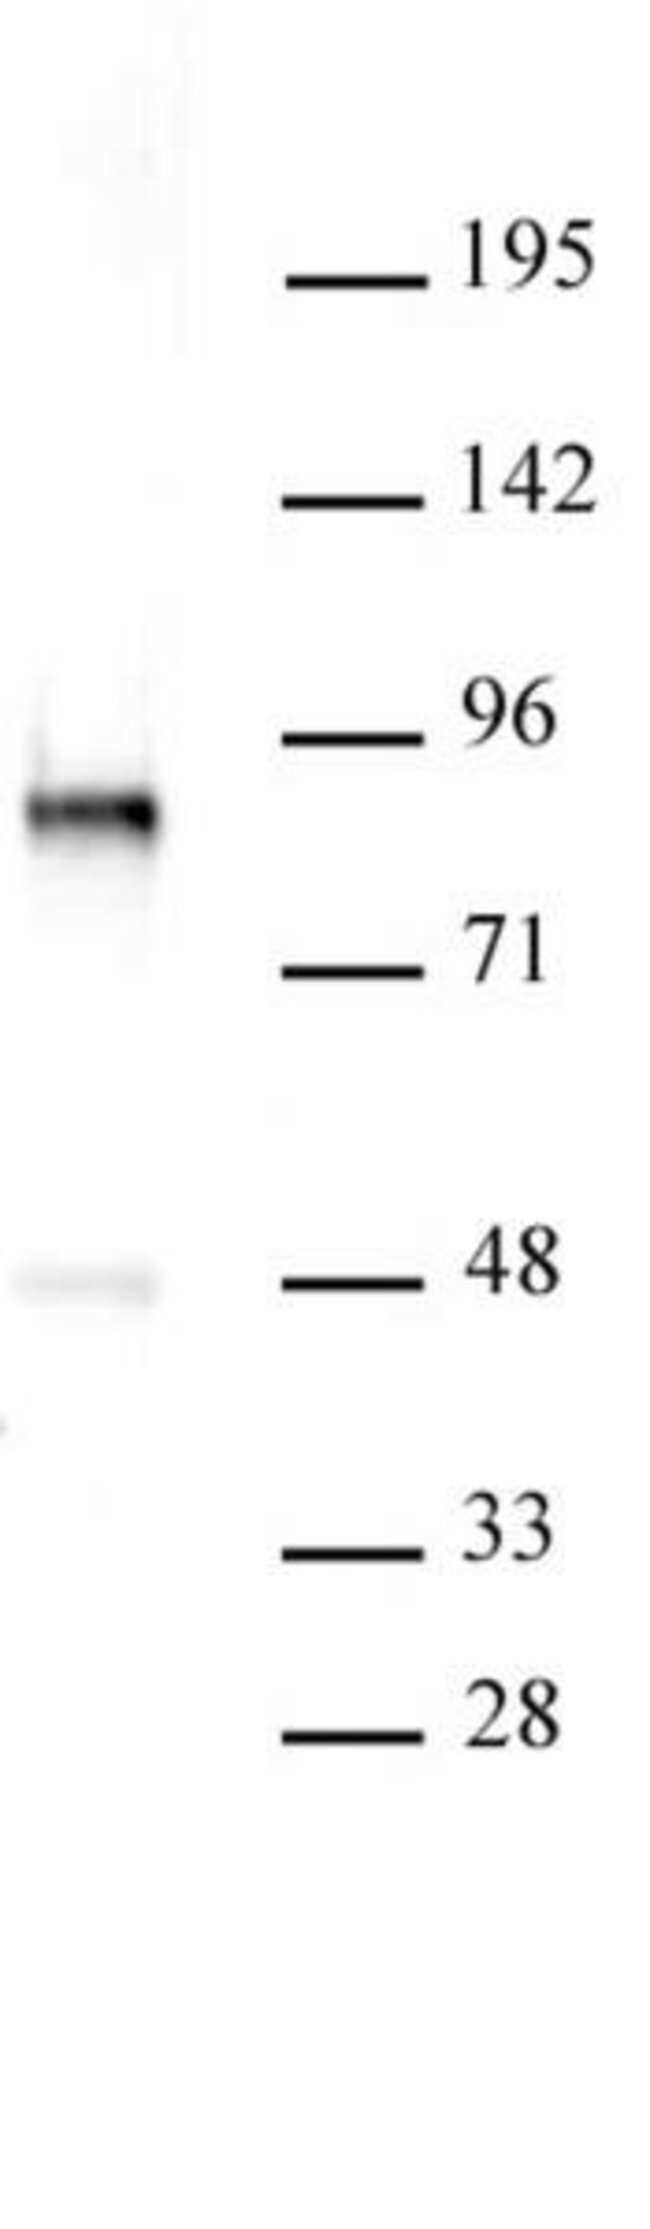 PKC-B Rabbit anti-Human, Unconjugated, Polyclonal, Active Motif:Antibodies:Primary